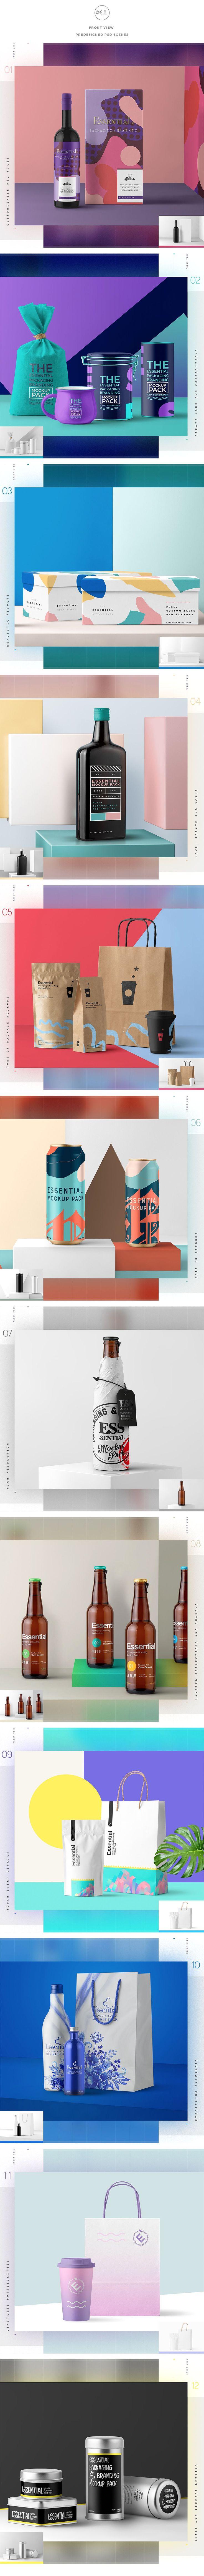 Essential Packaging Branding Mockup by Mockup Zone on @creativemarket